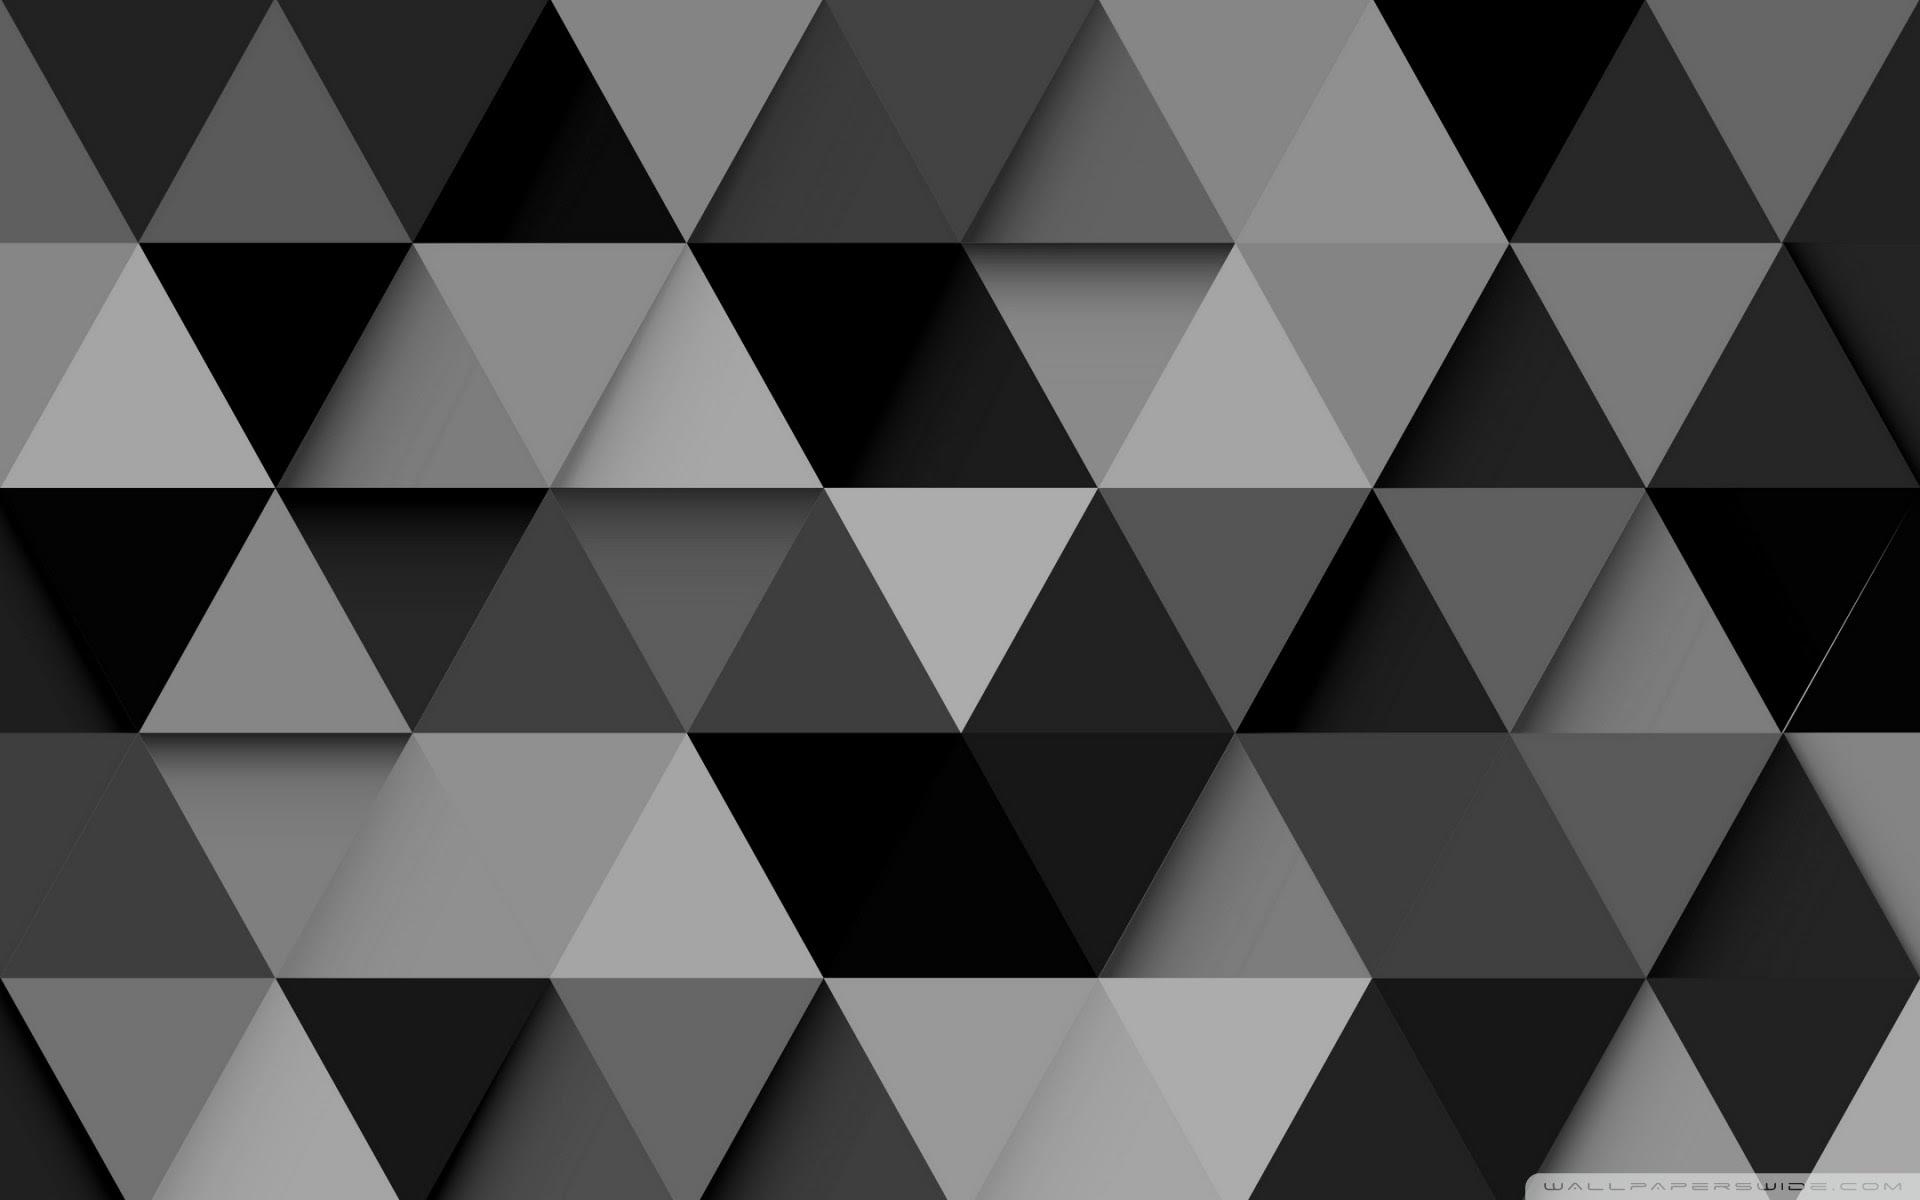 Abstract Black Design 4k Hd Desktop Wallpaper For 4k Ultra Hd Tv